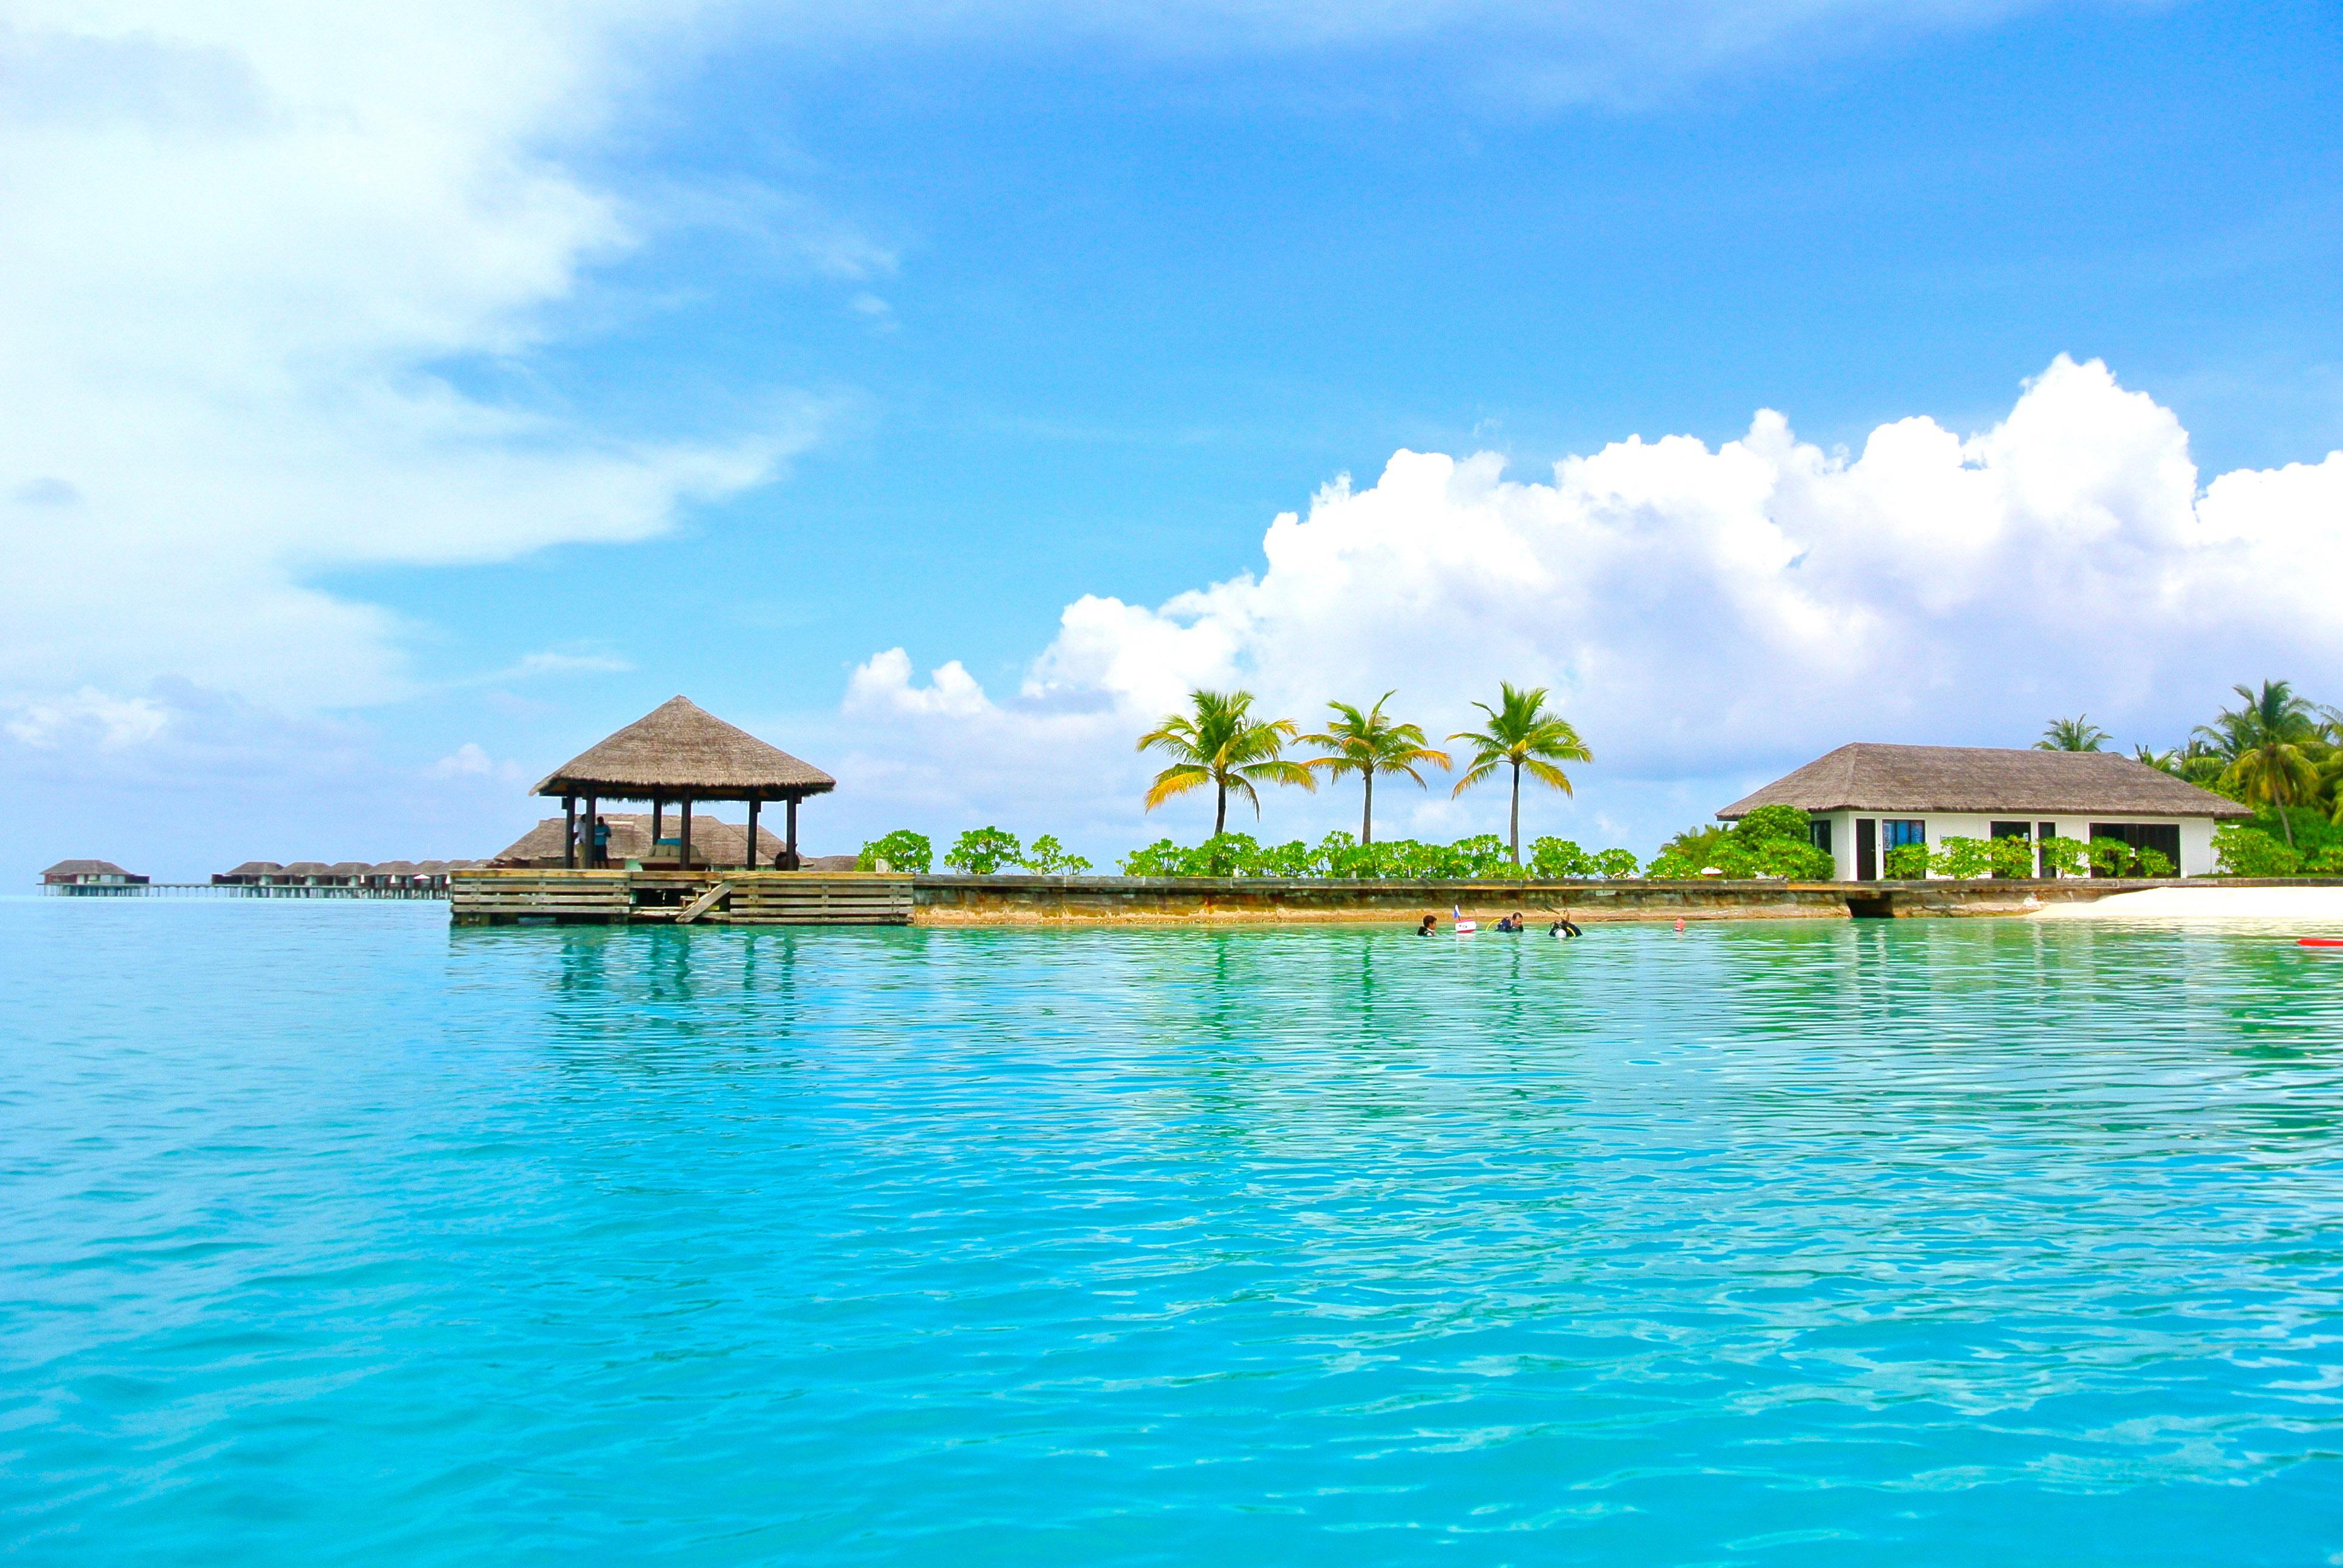 Resort clipart ocean beach #4